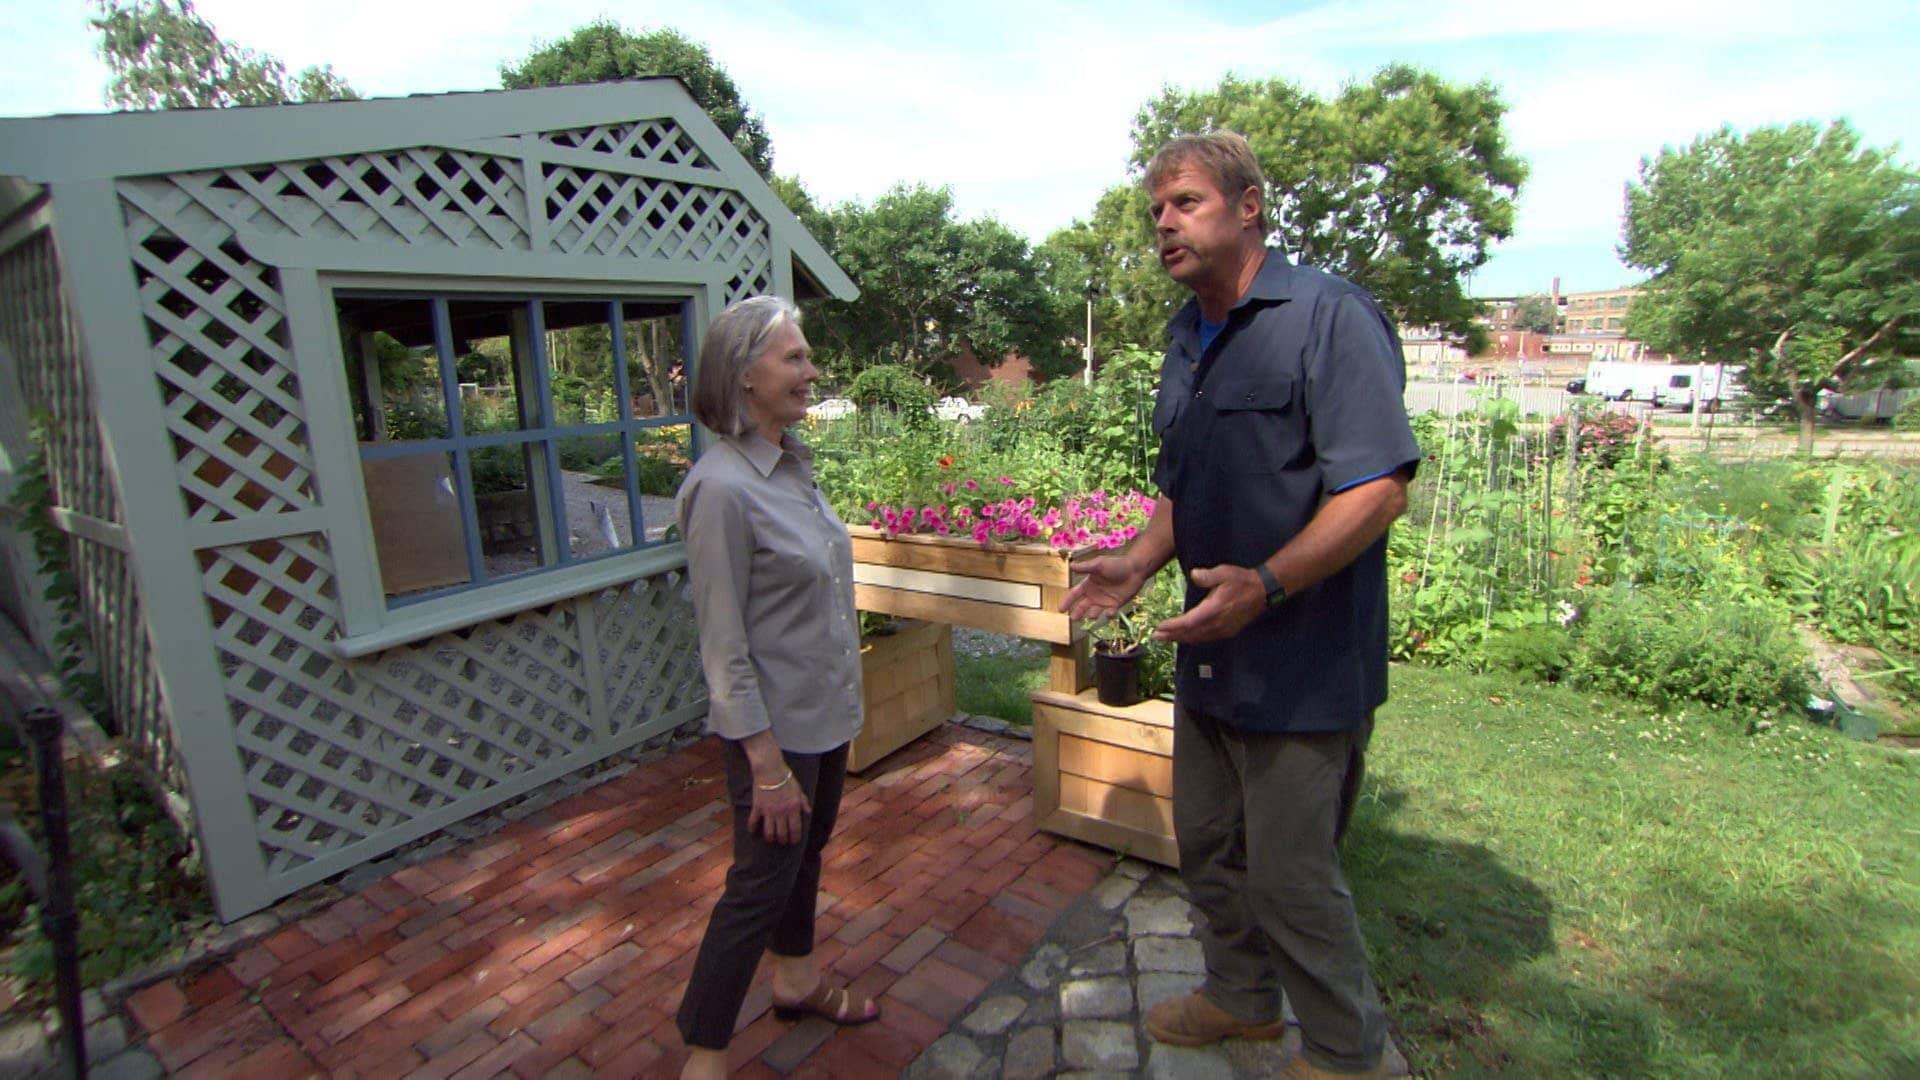 Charlestown 2014: Gardens and Greek Revival